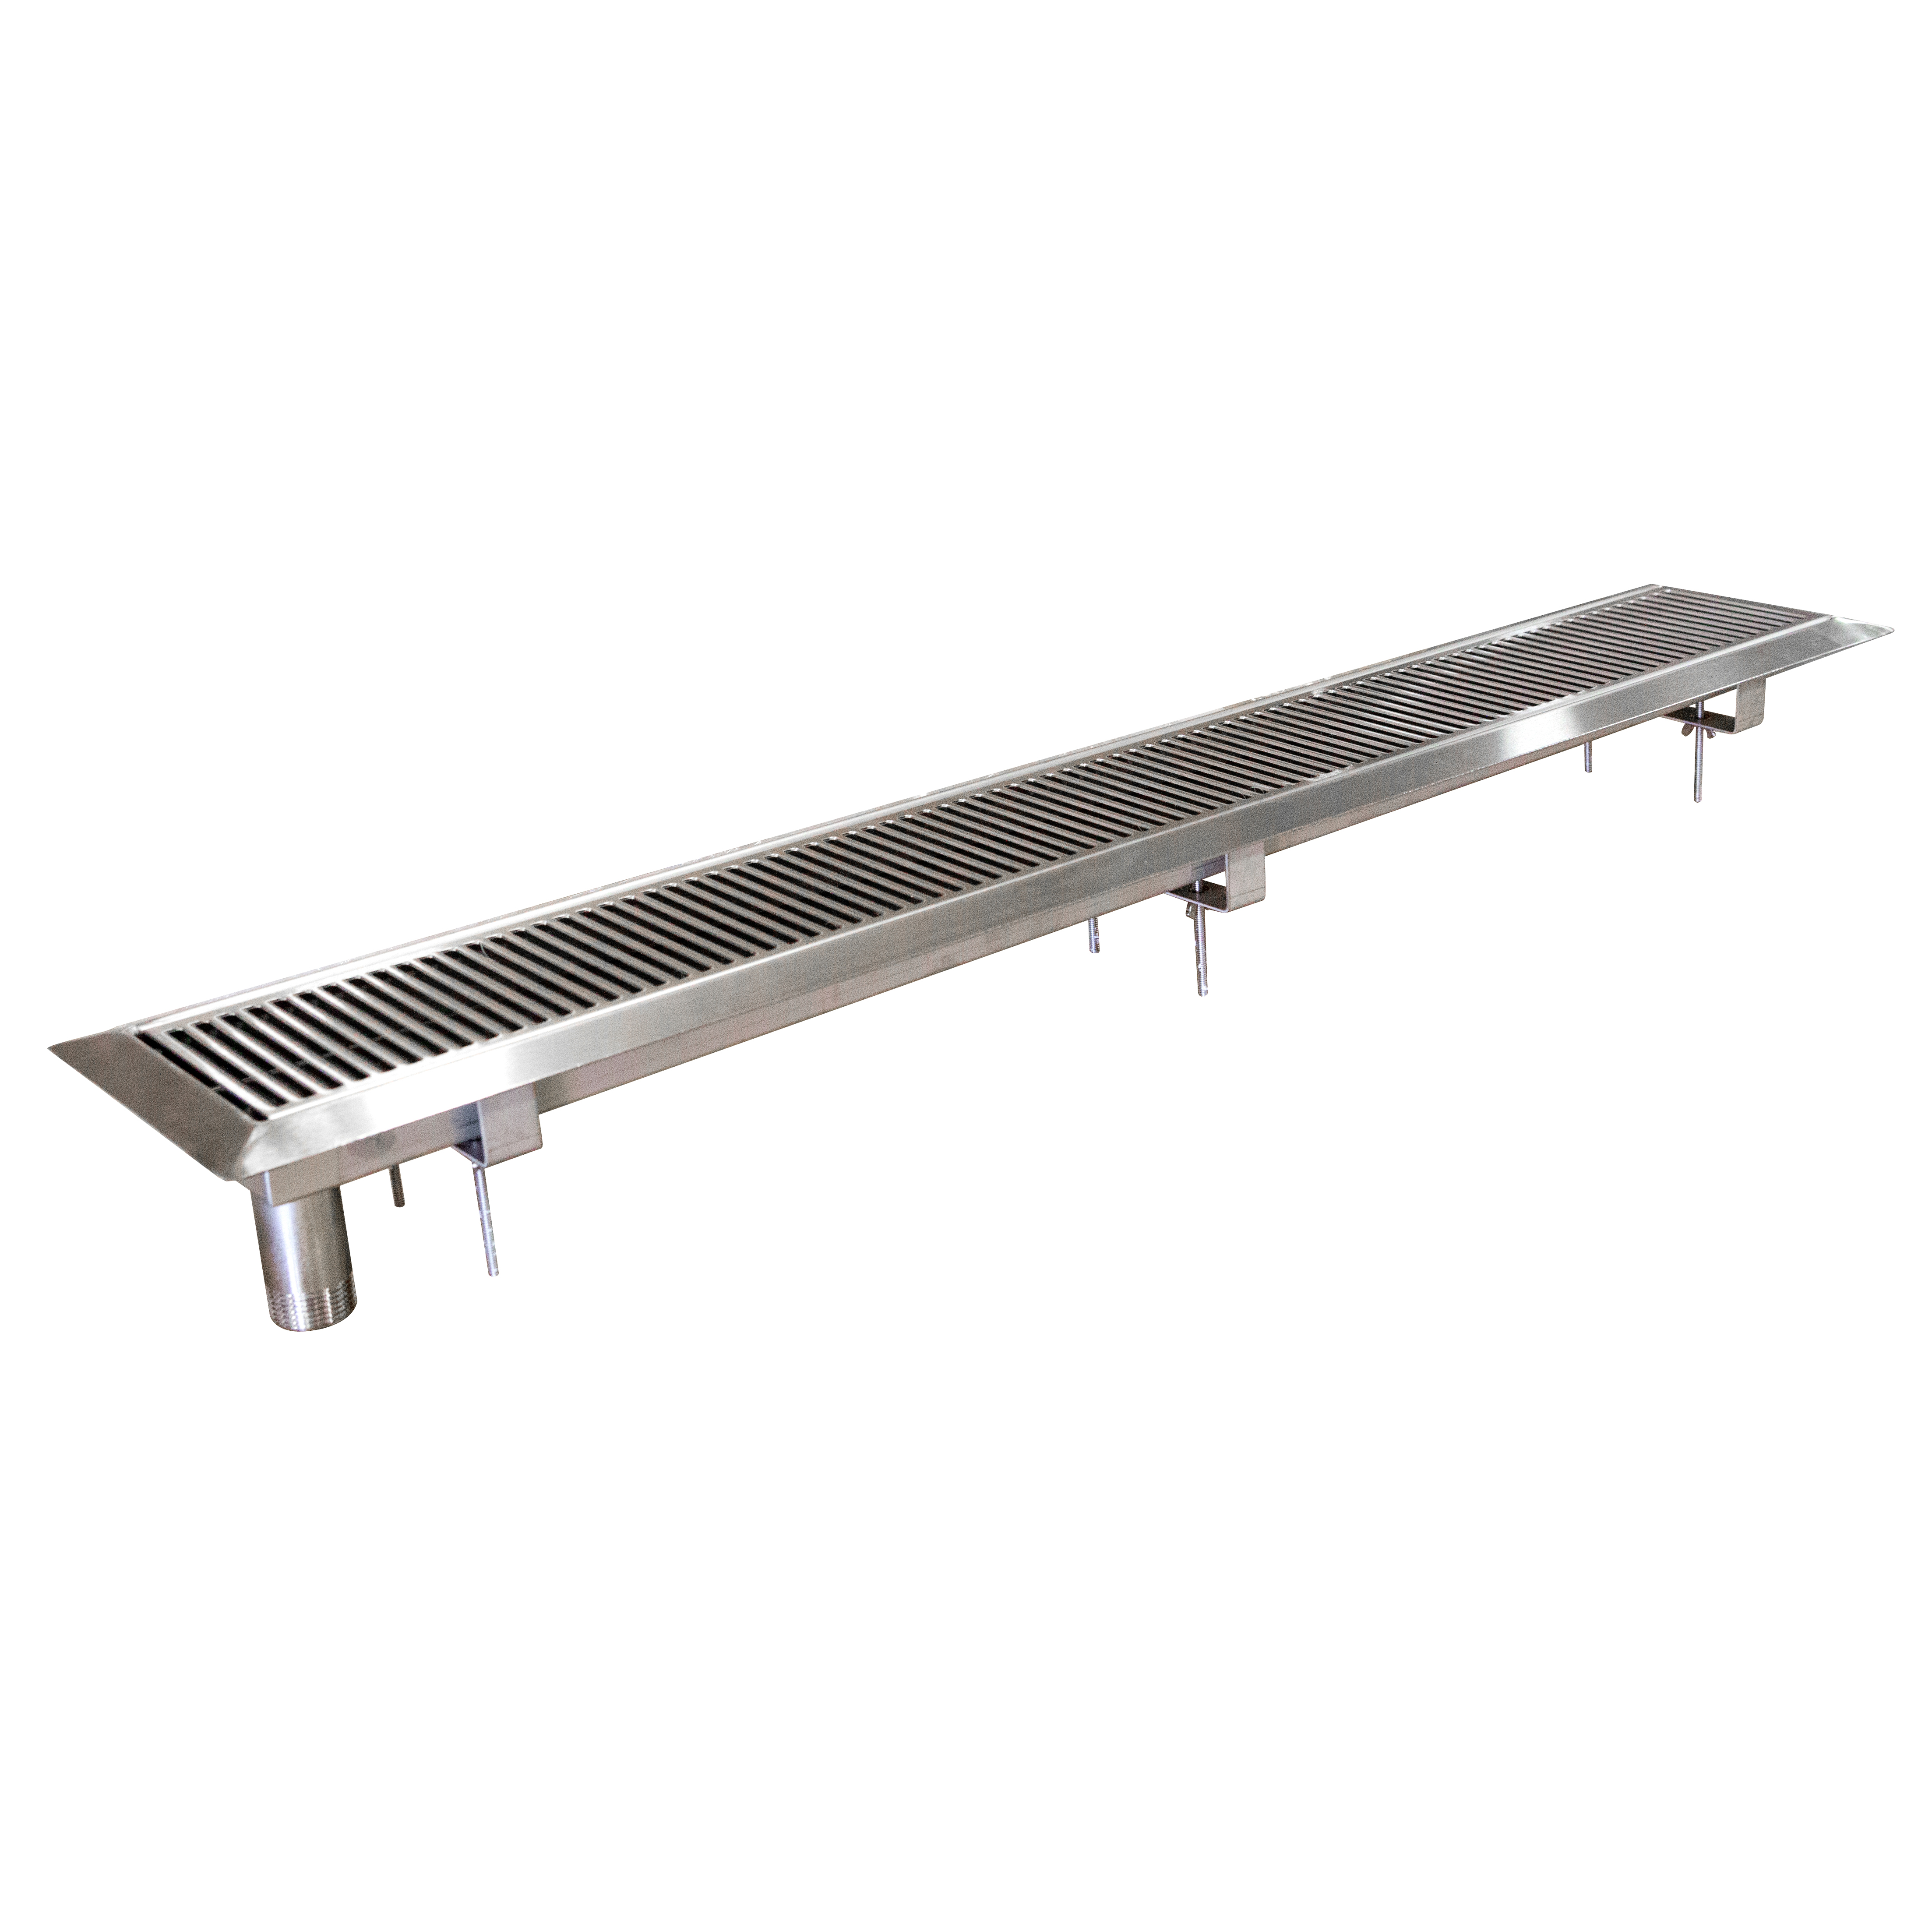 John Boos URN60 drip tray trough, beverage